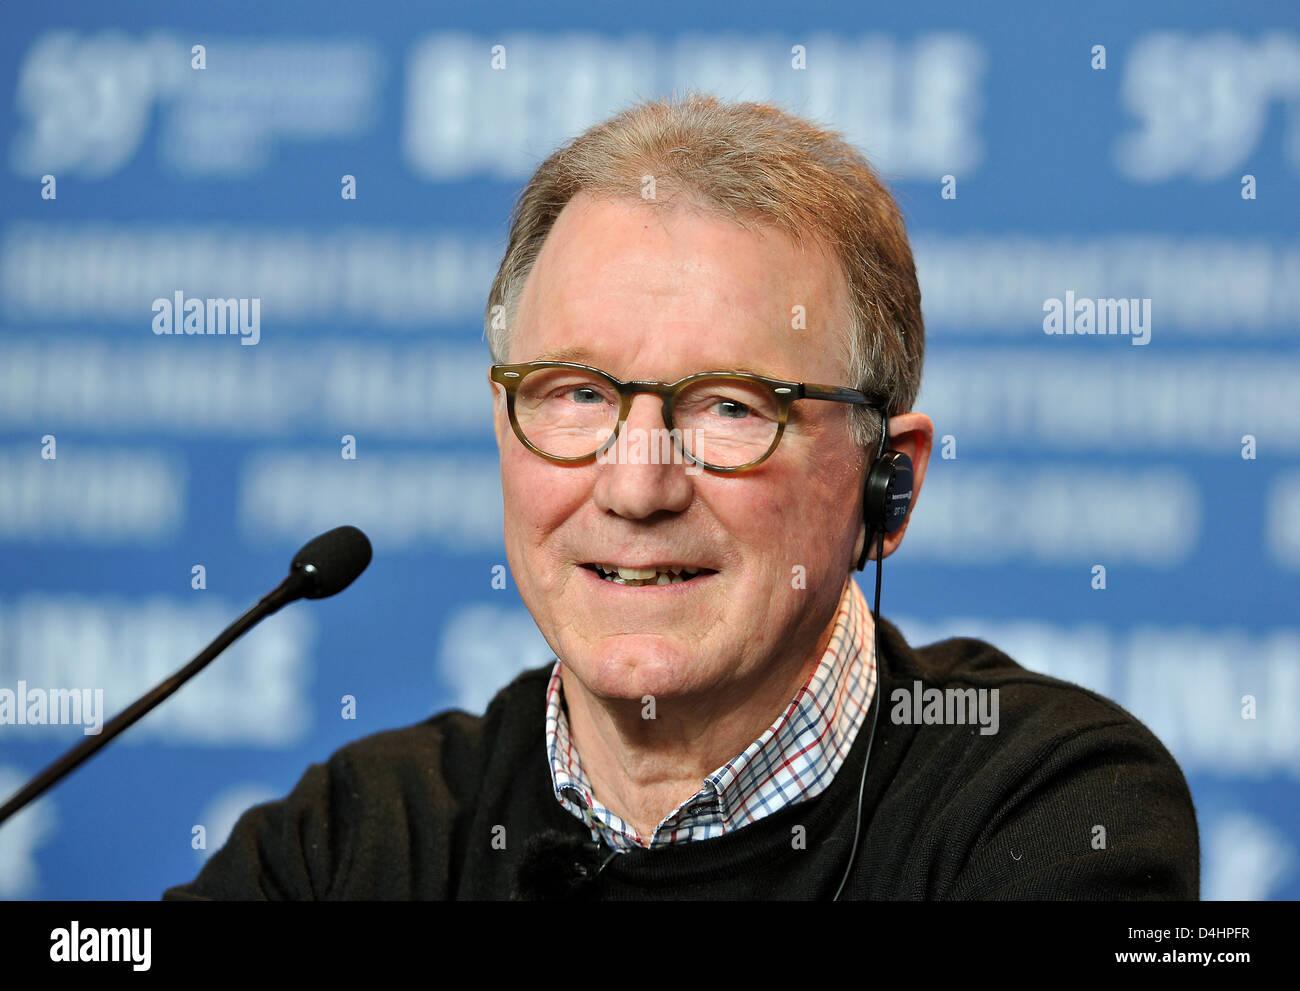 Danish actor <b>Finn Nielsen</b> smiles during a press conference of her film ? - danish-actor-finn-nielsen-smiles-during-a-press-conference-of-her-D4HPFR